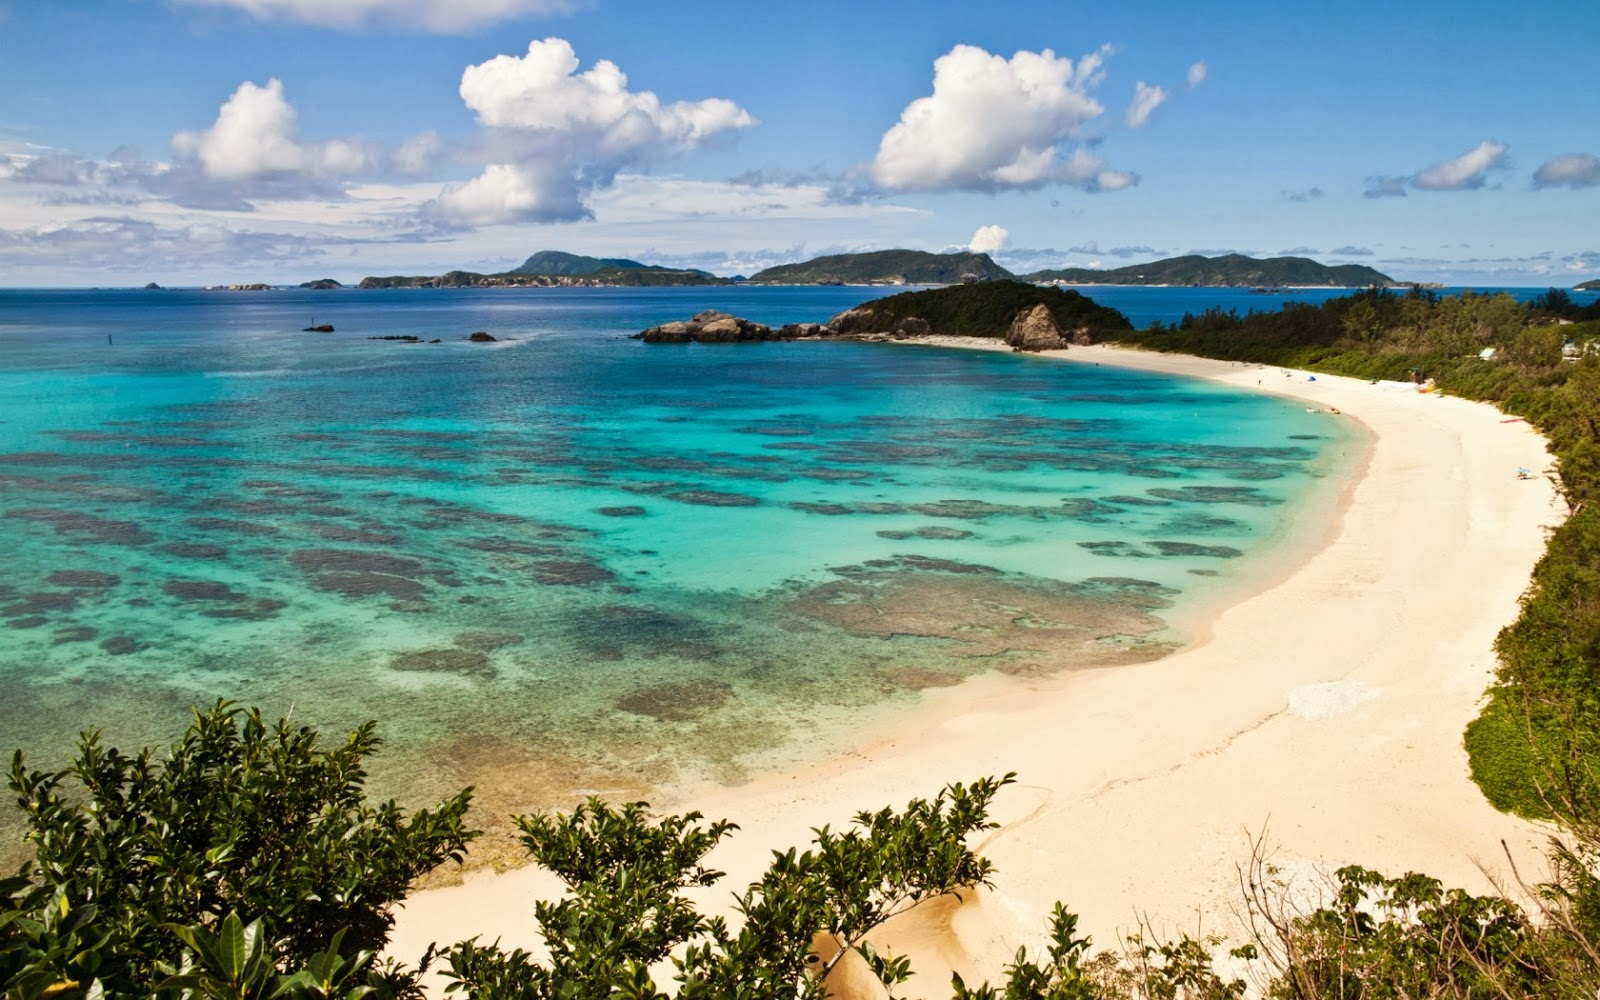 HD Maya Bay Beach Wallpaper